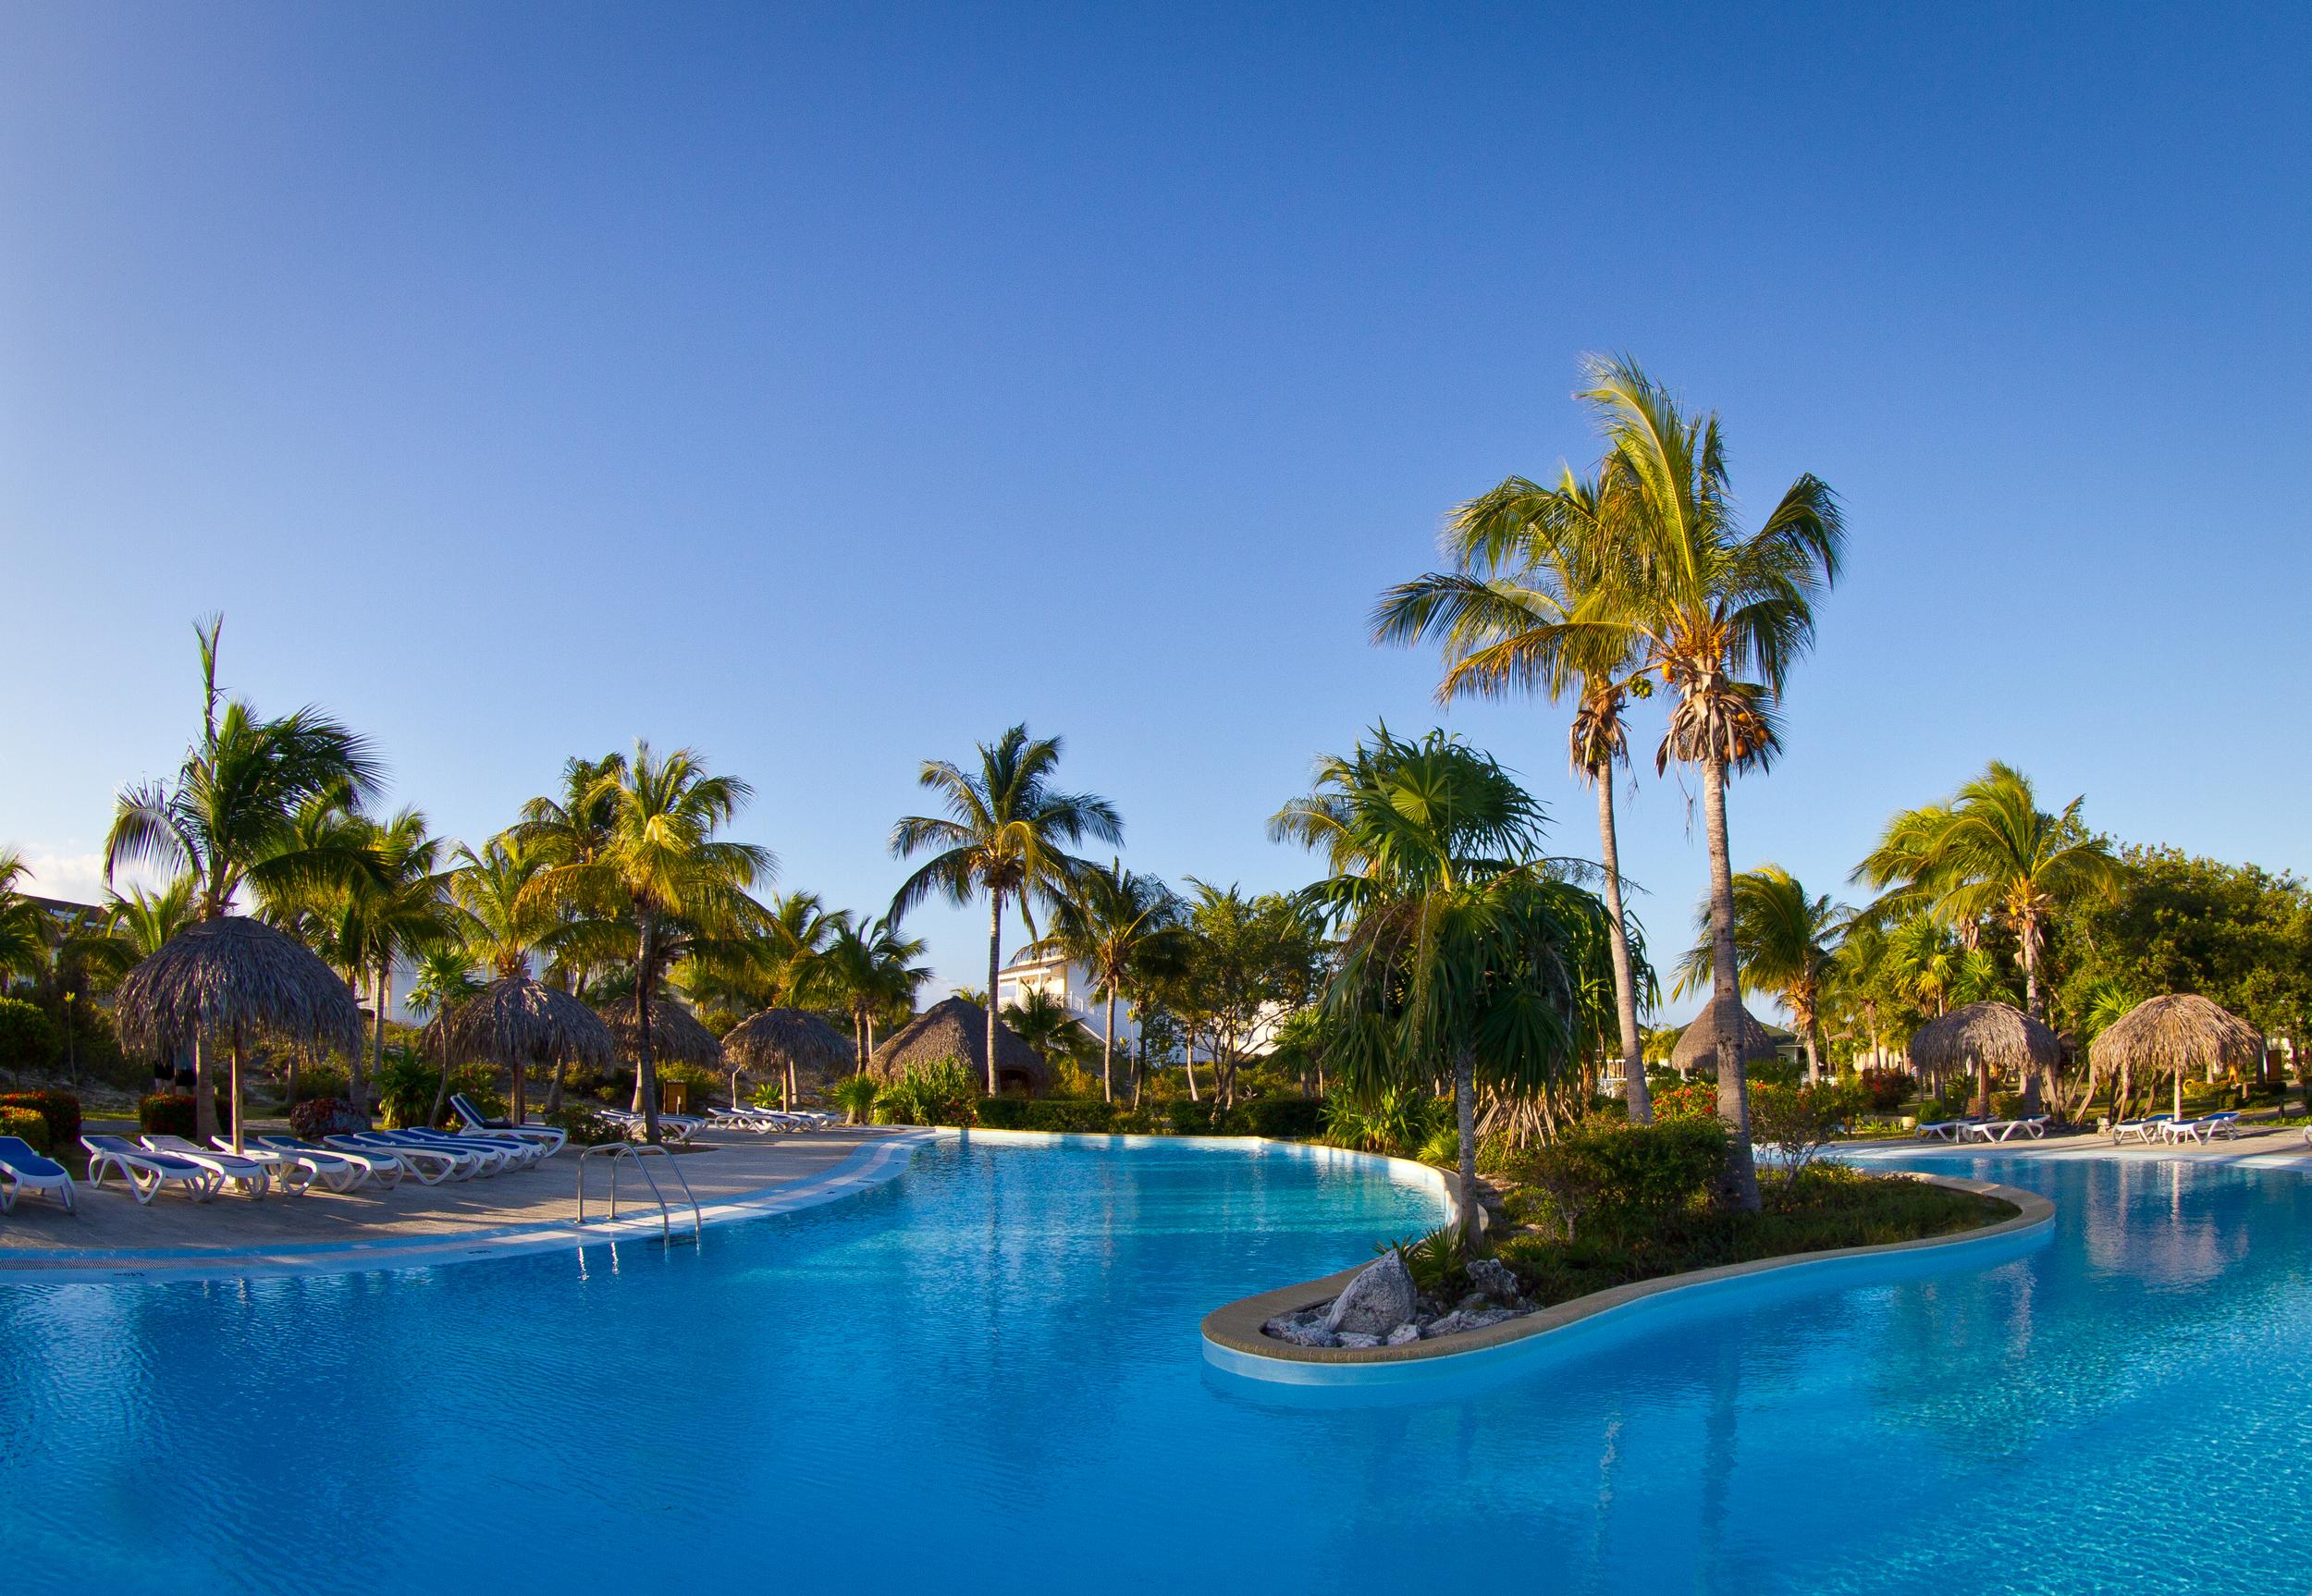 The pool at Sol Club, Cayo Largo. Cuba